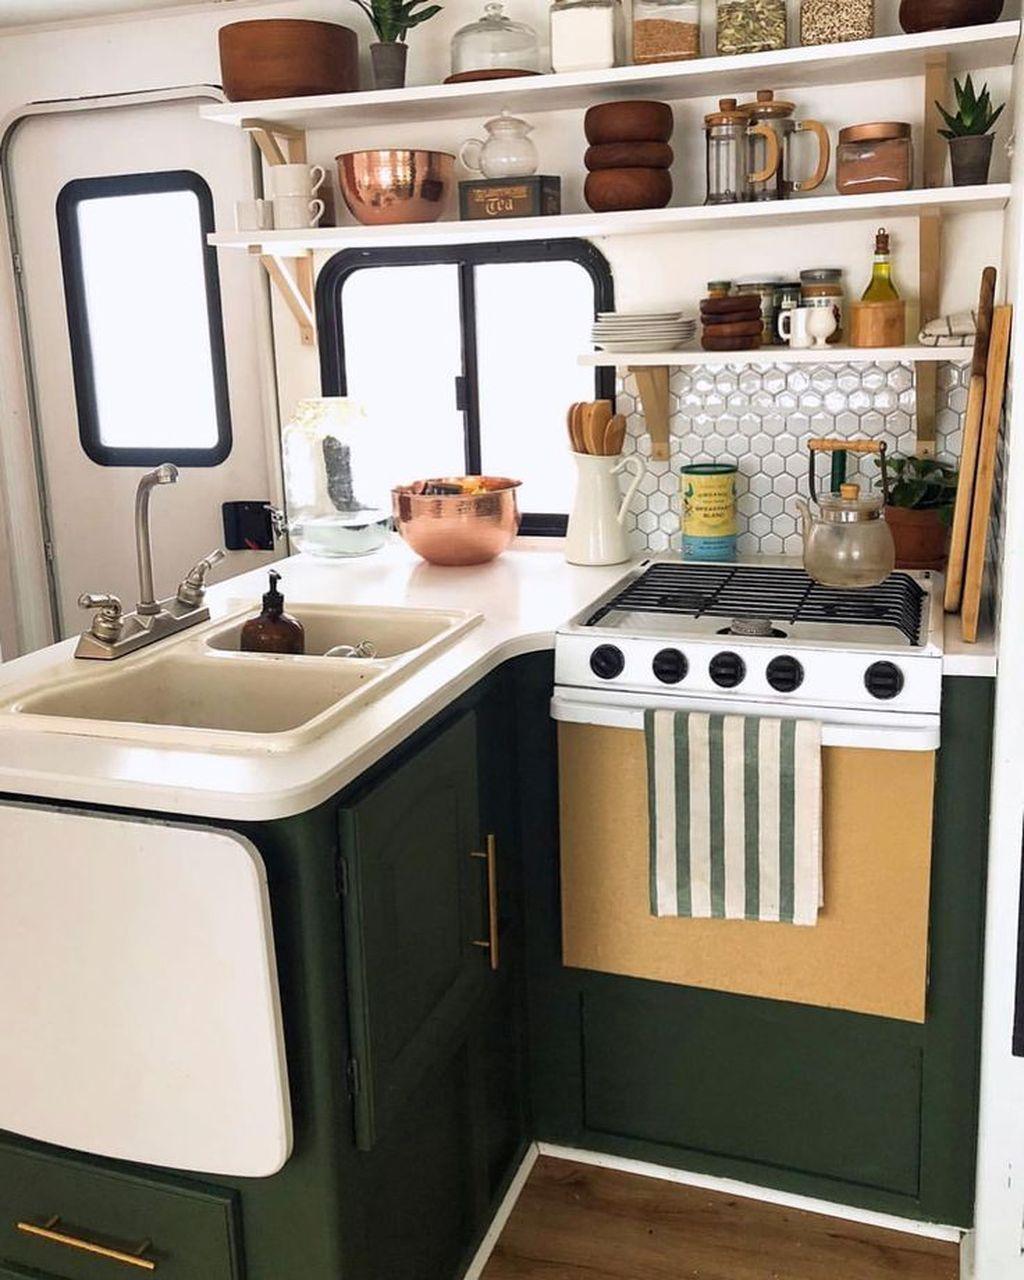 Inspiring RV Kitchen Design And Decor Ideas 19